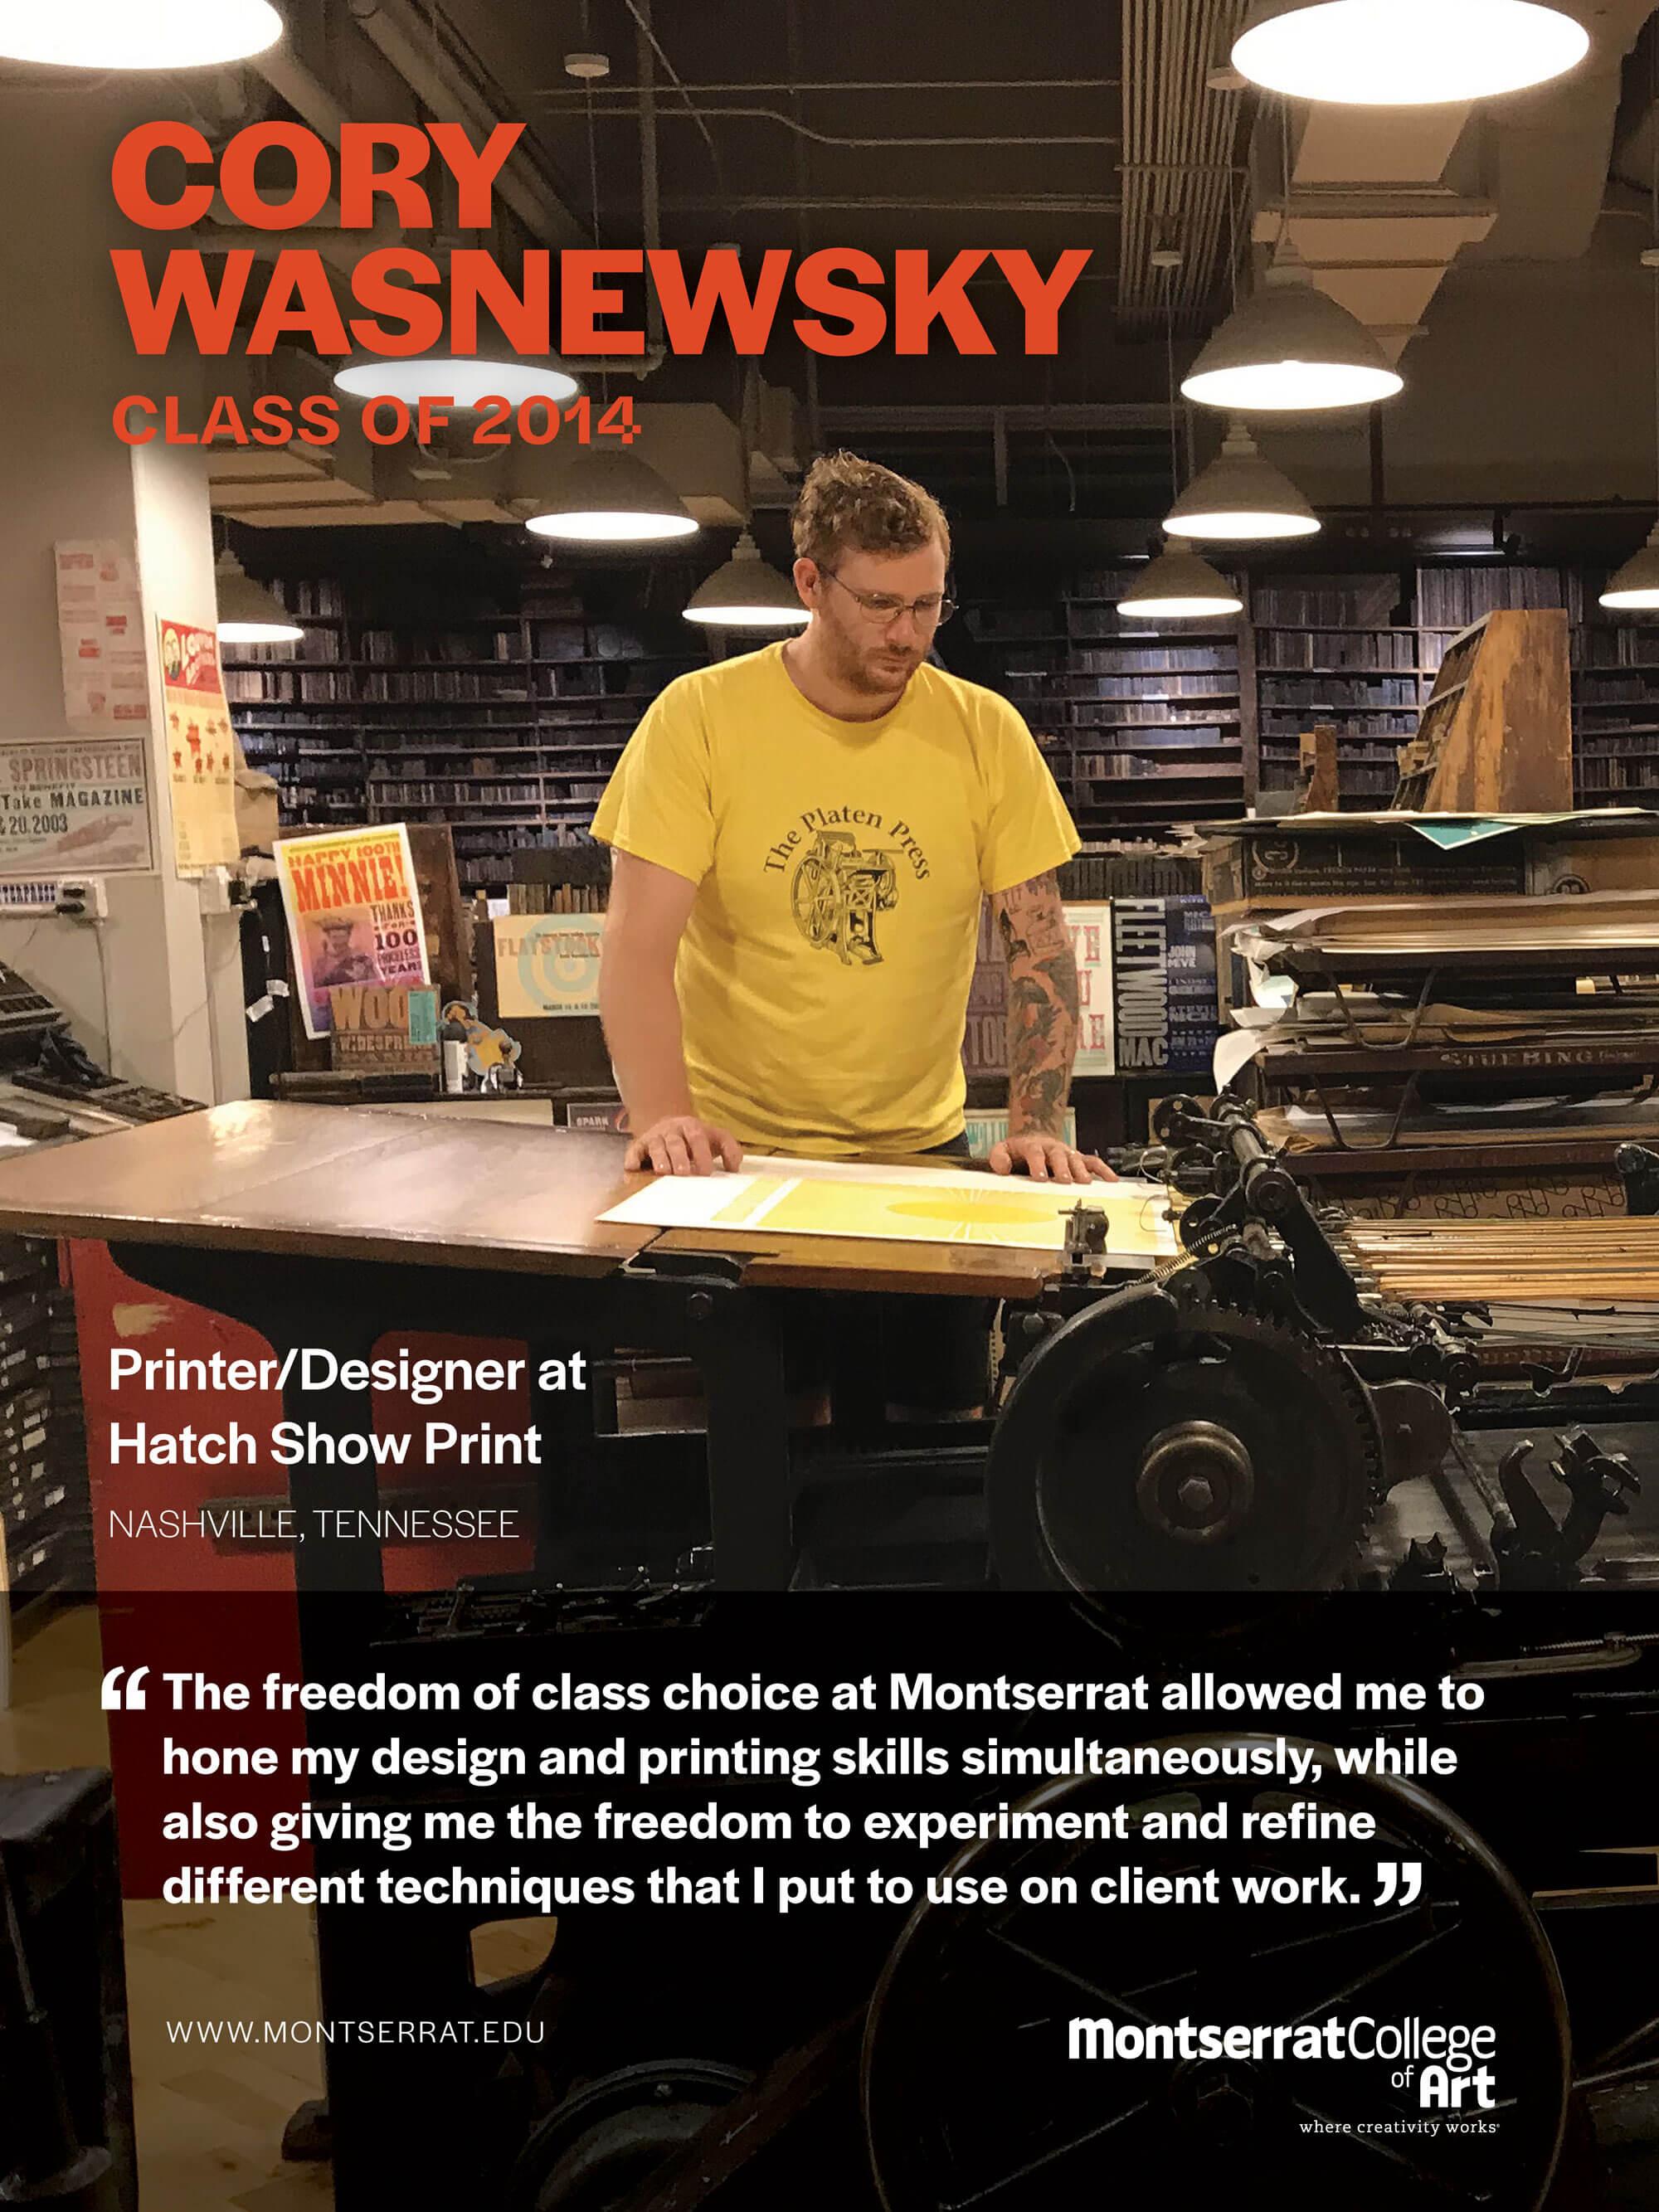 Cory Wasnewsky